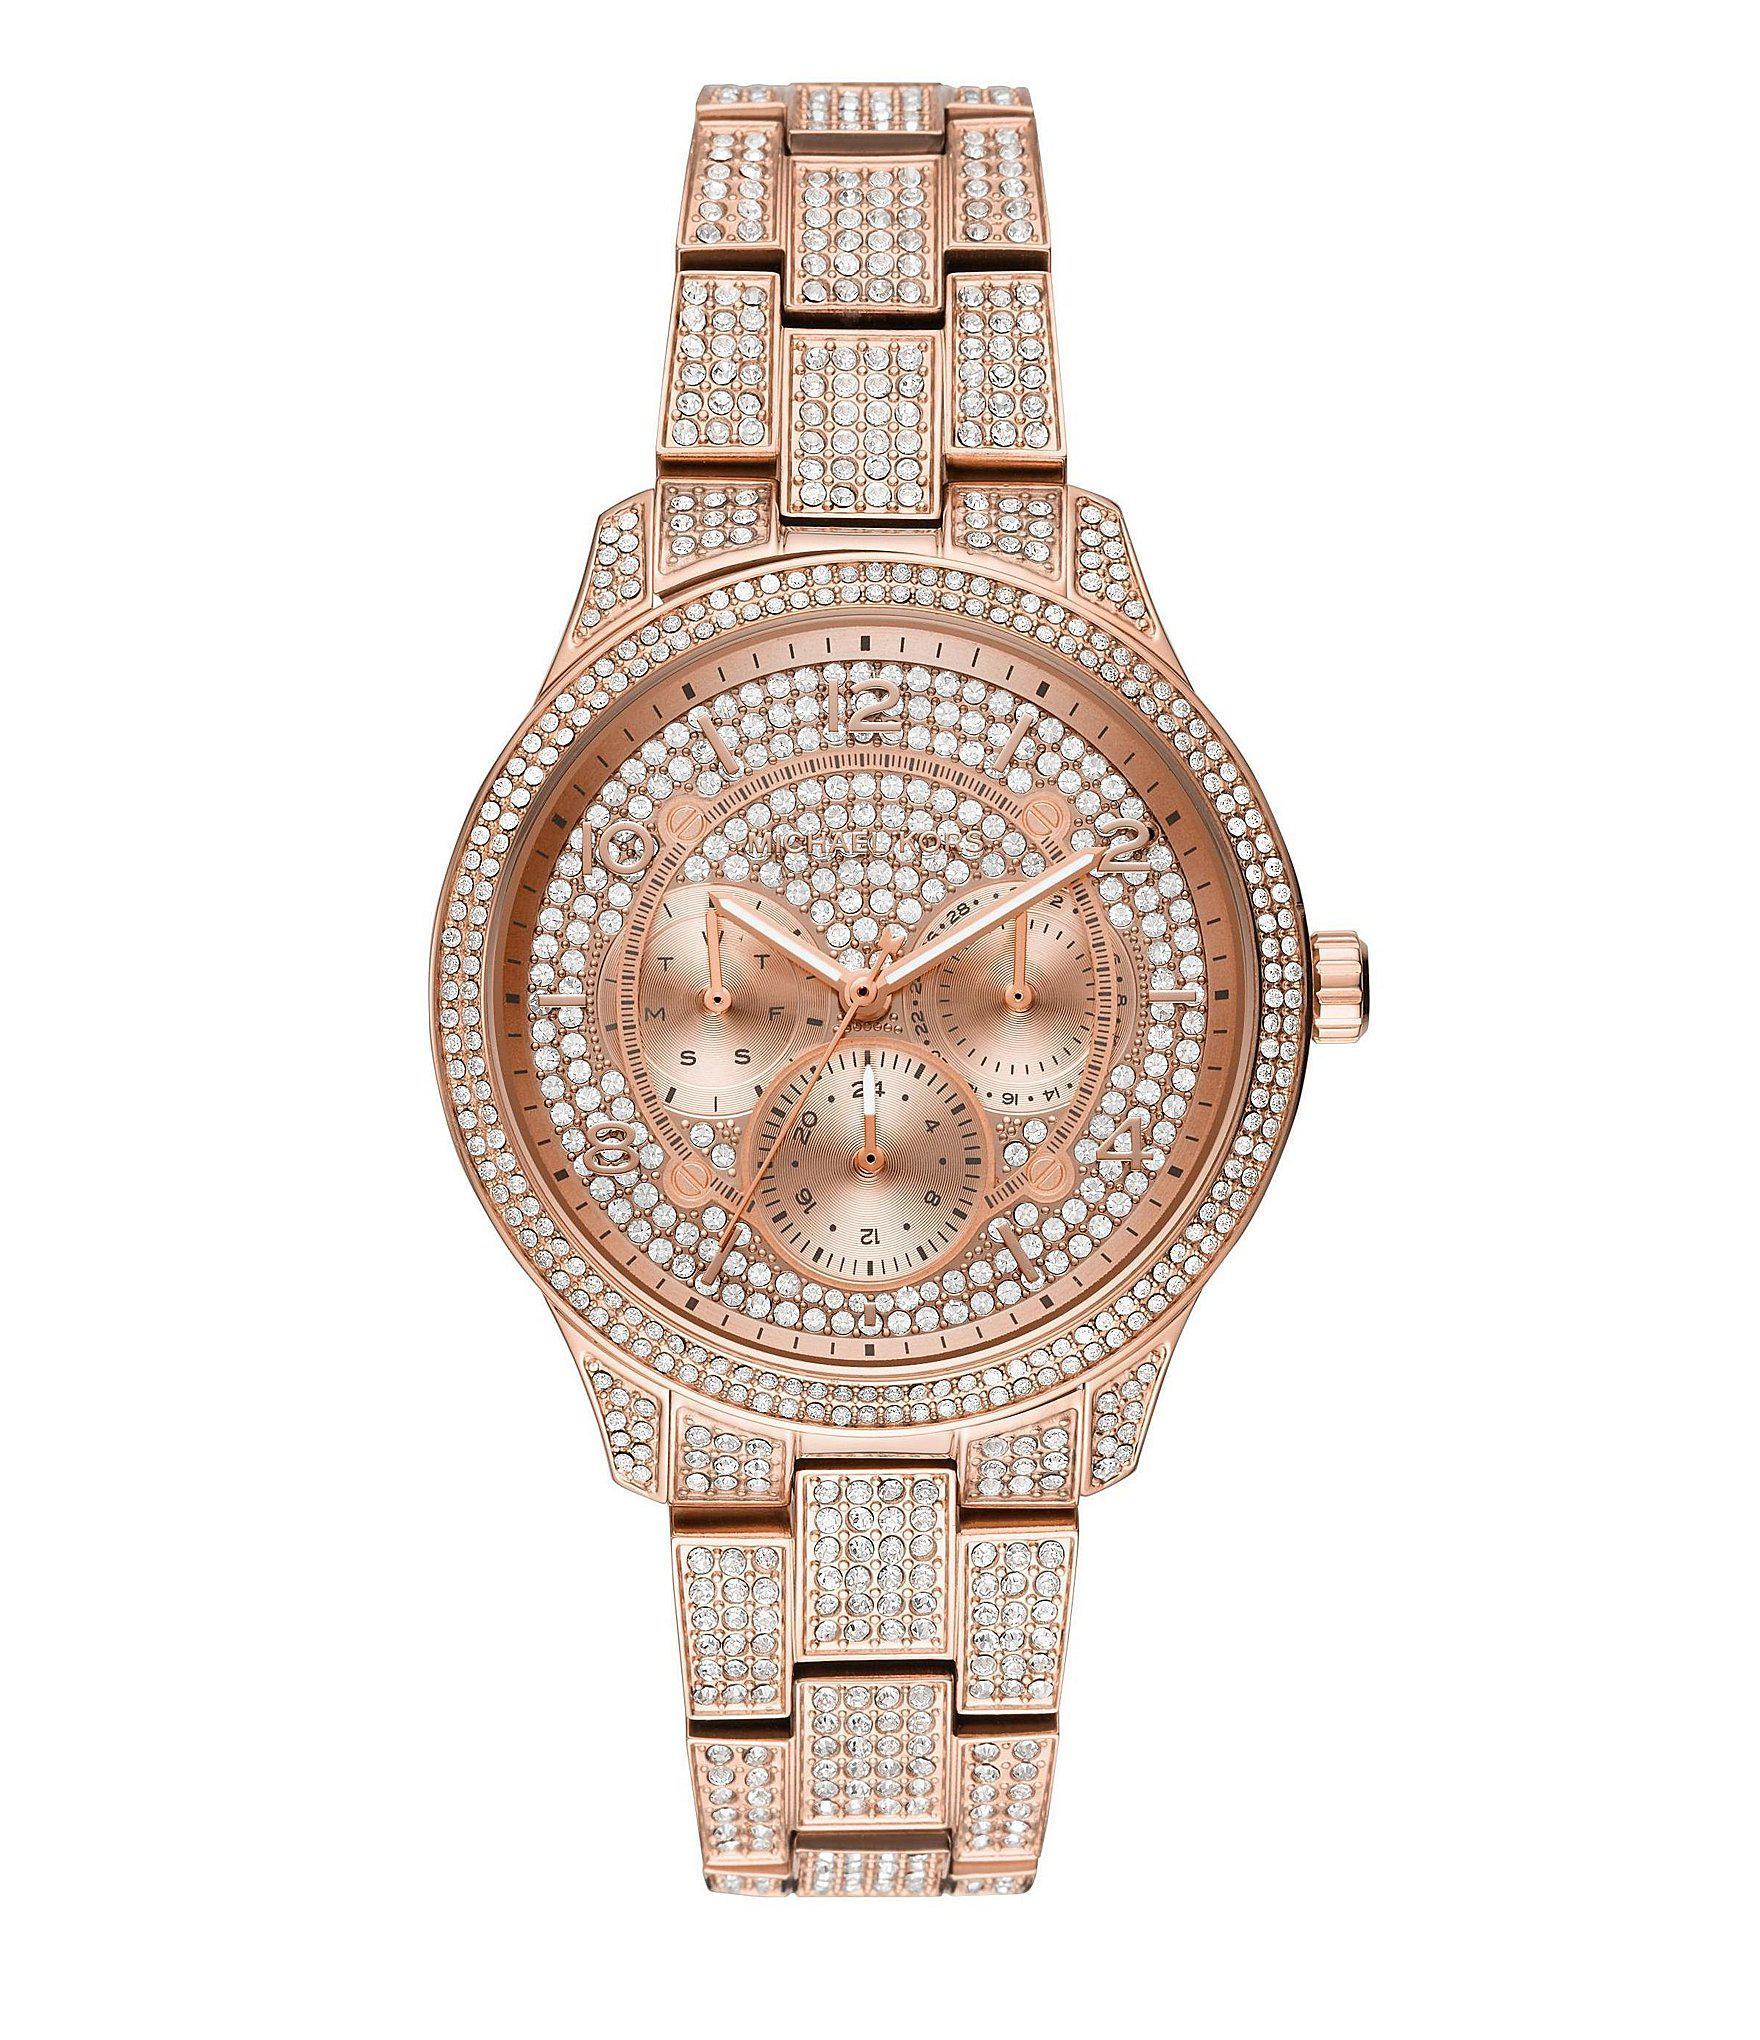 ad66ac157da1 Michael Kors. Women s Metallic Runway Multifunction Pave Rose Gold-tone  Stainless Steel Watch